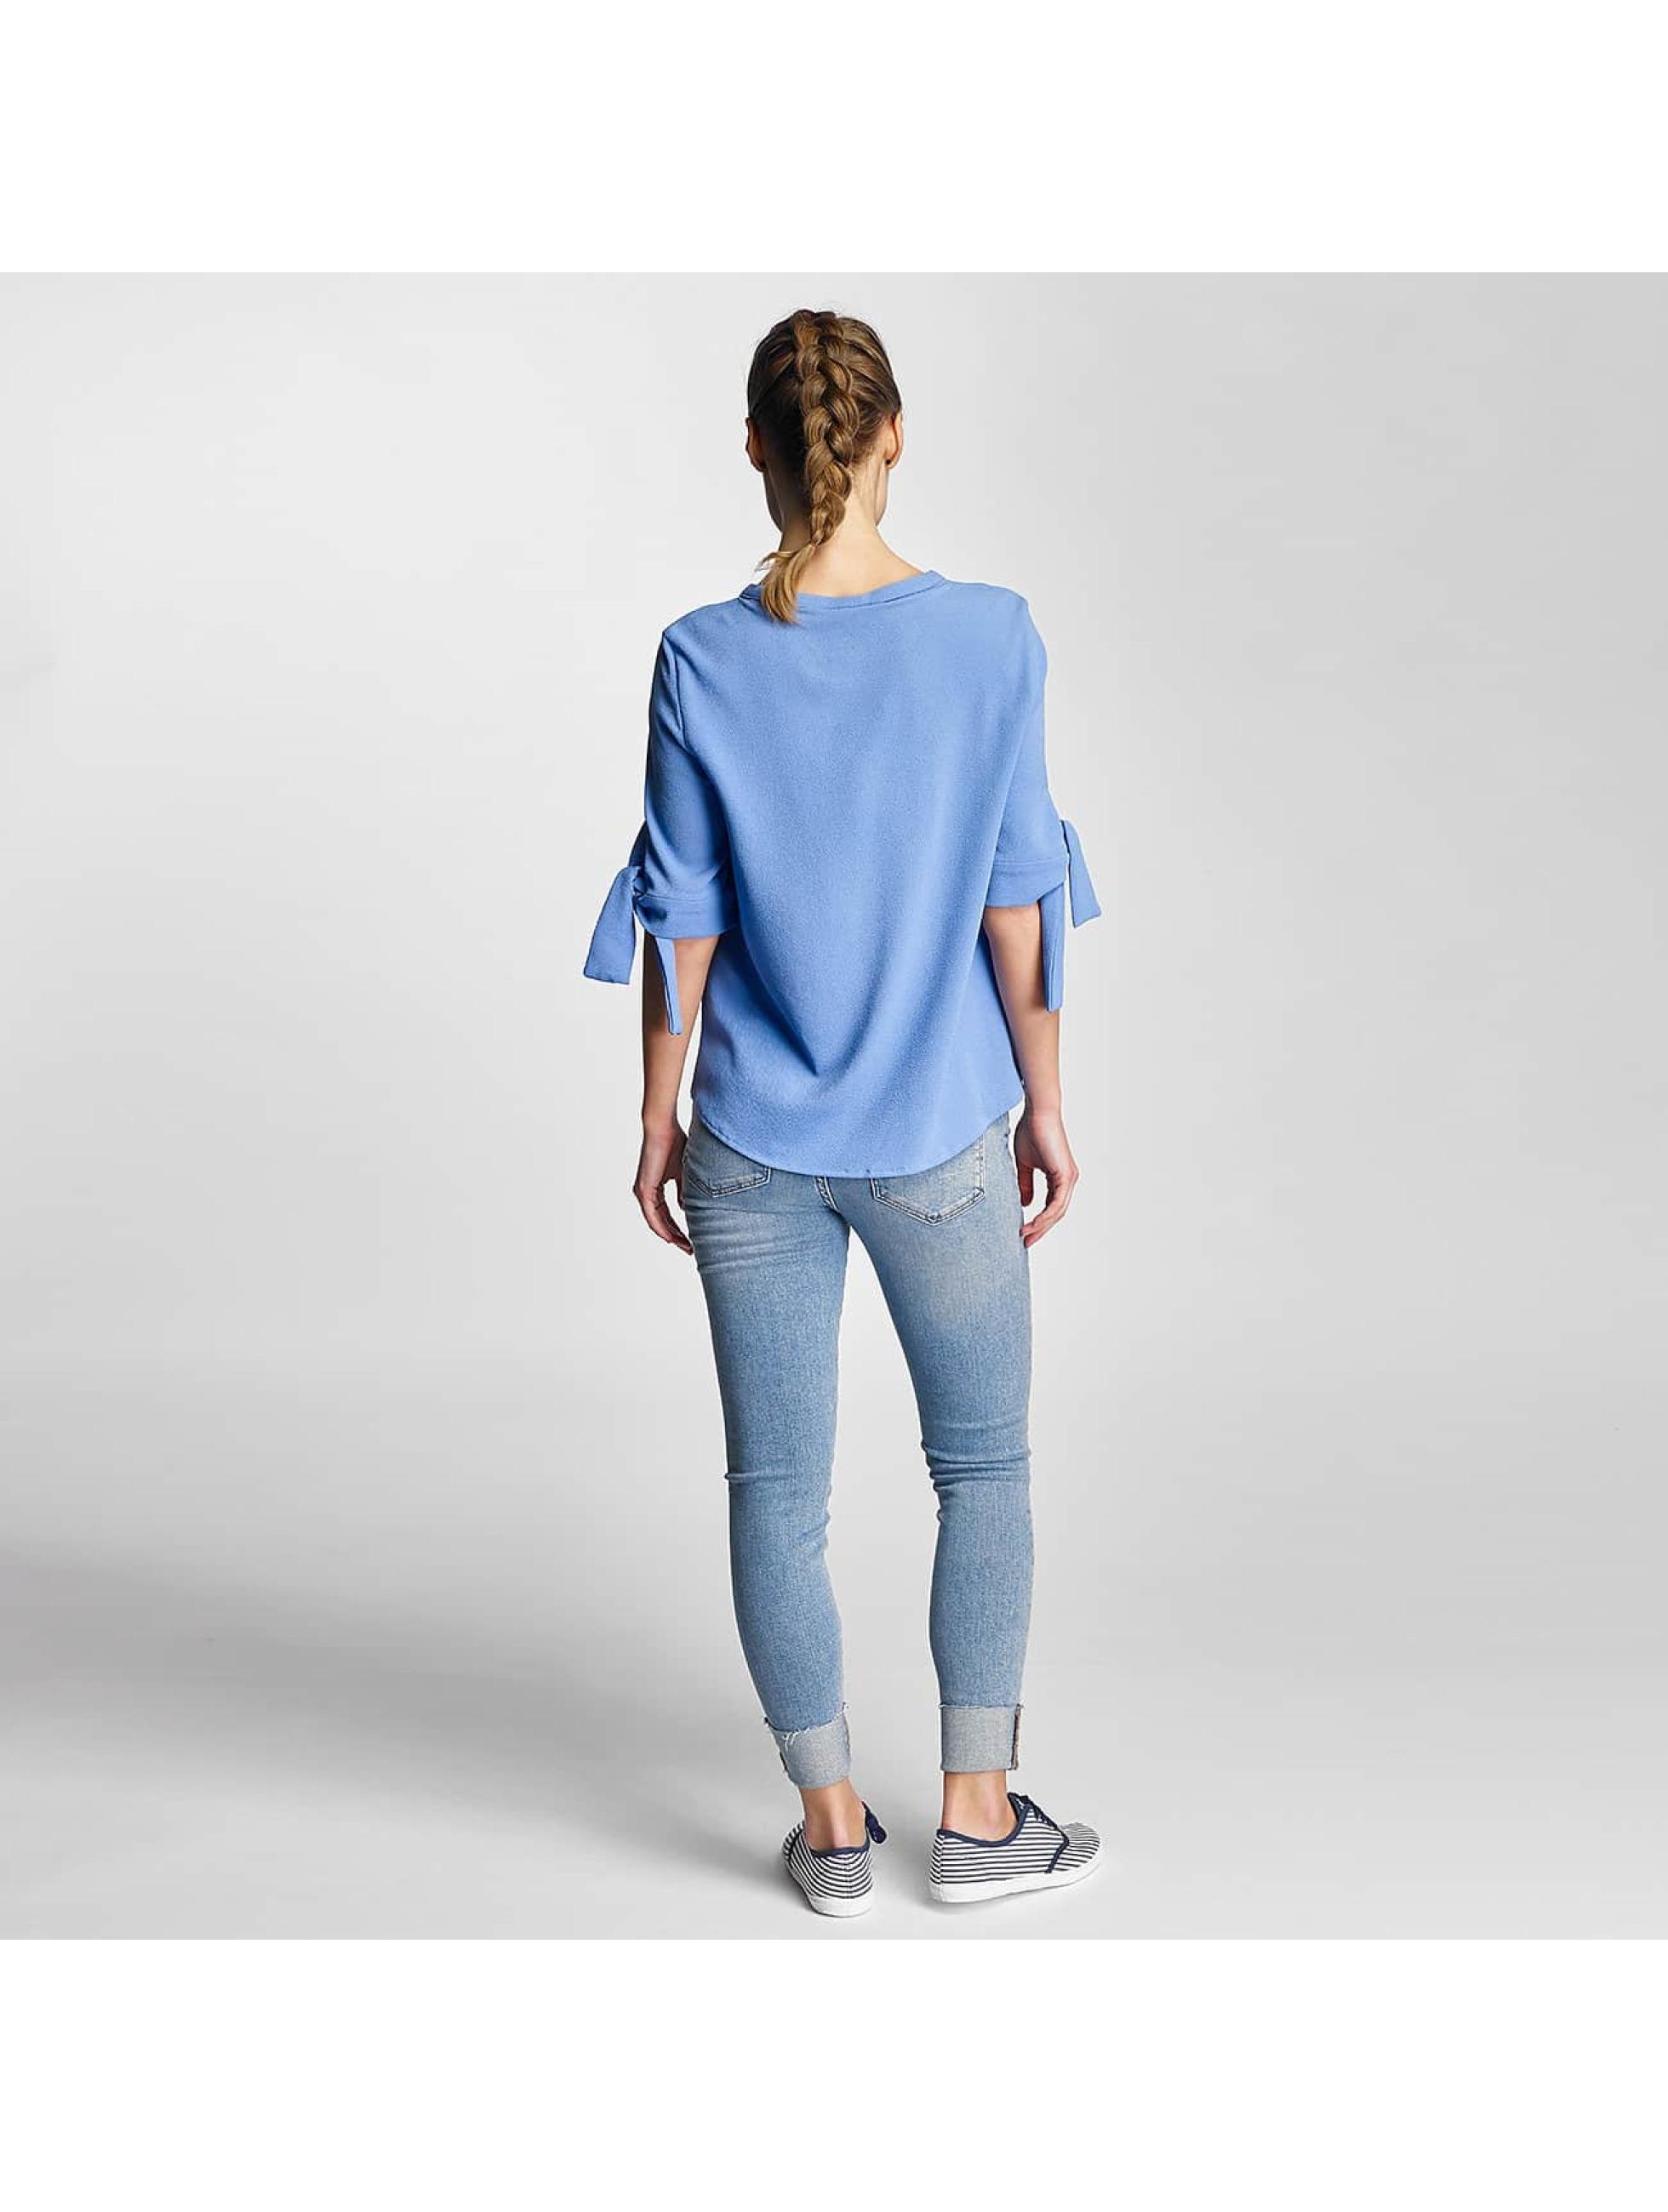 Vero Moda Blus/Tunika VmGertrud blå